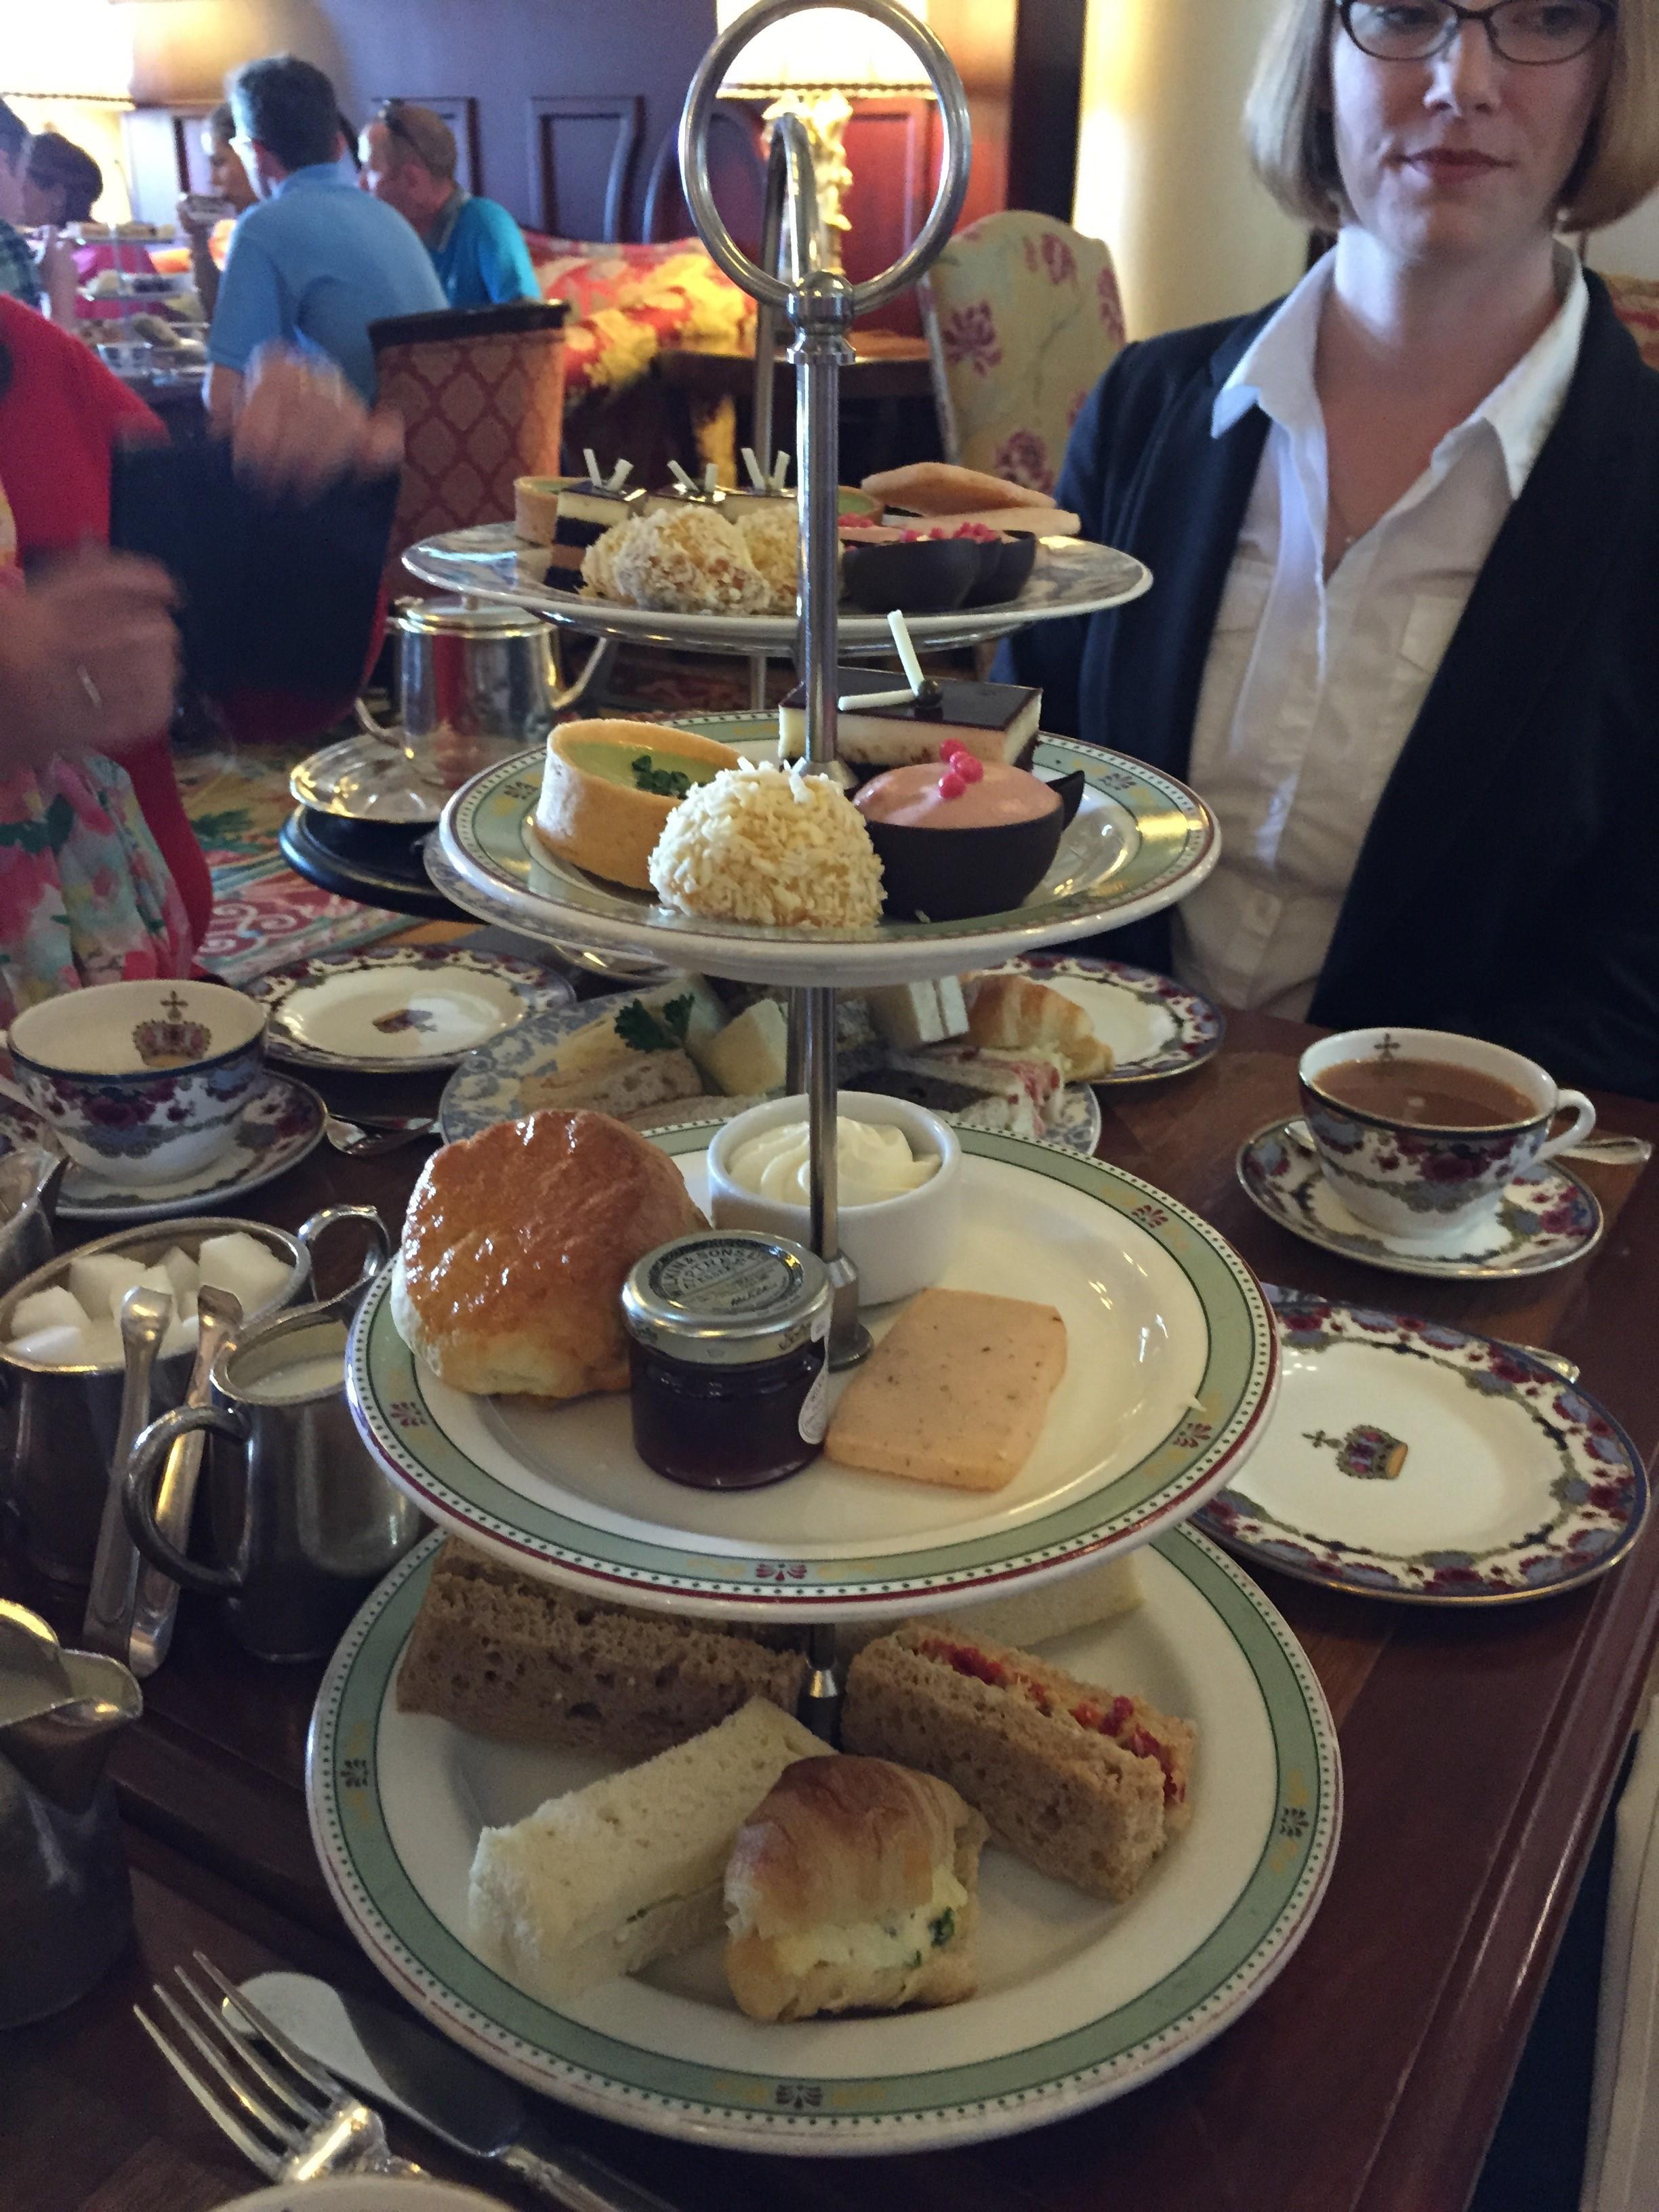 High Tea at The Fairmont Empress Hotel